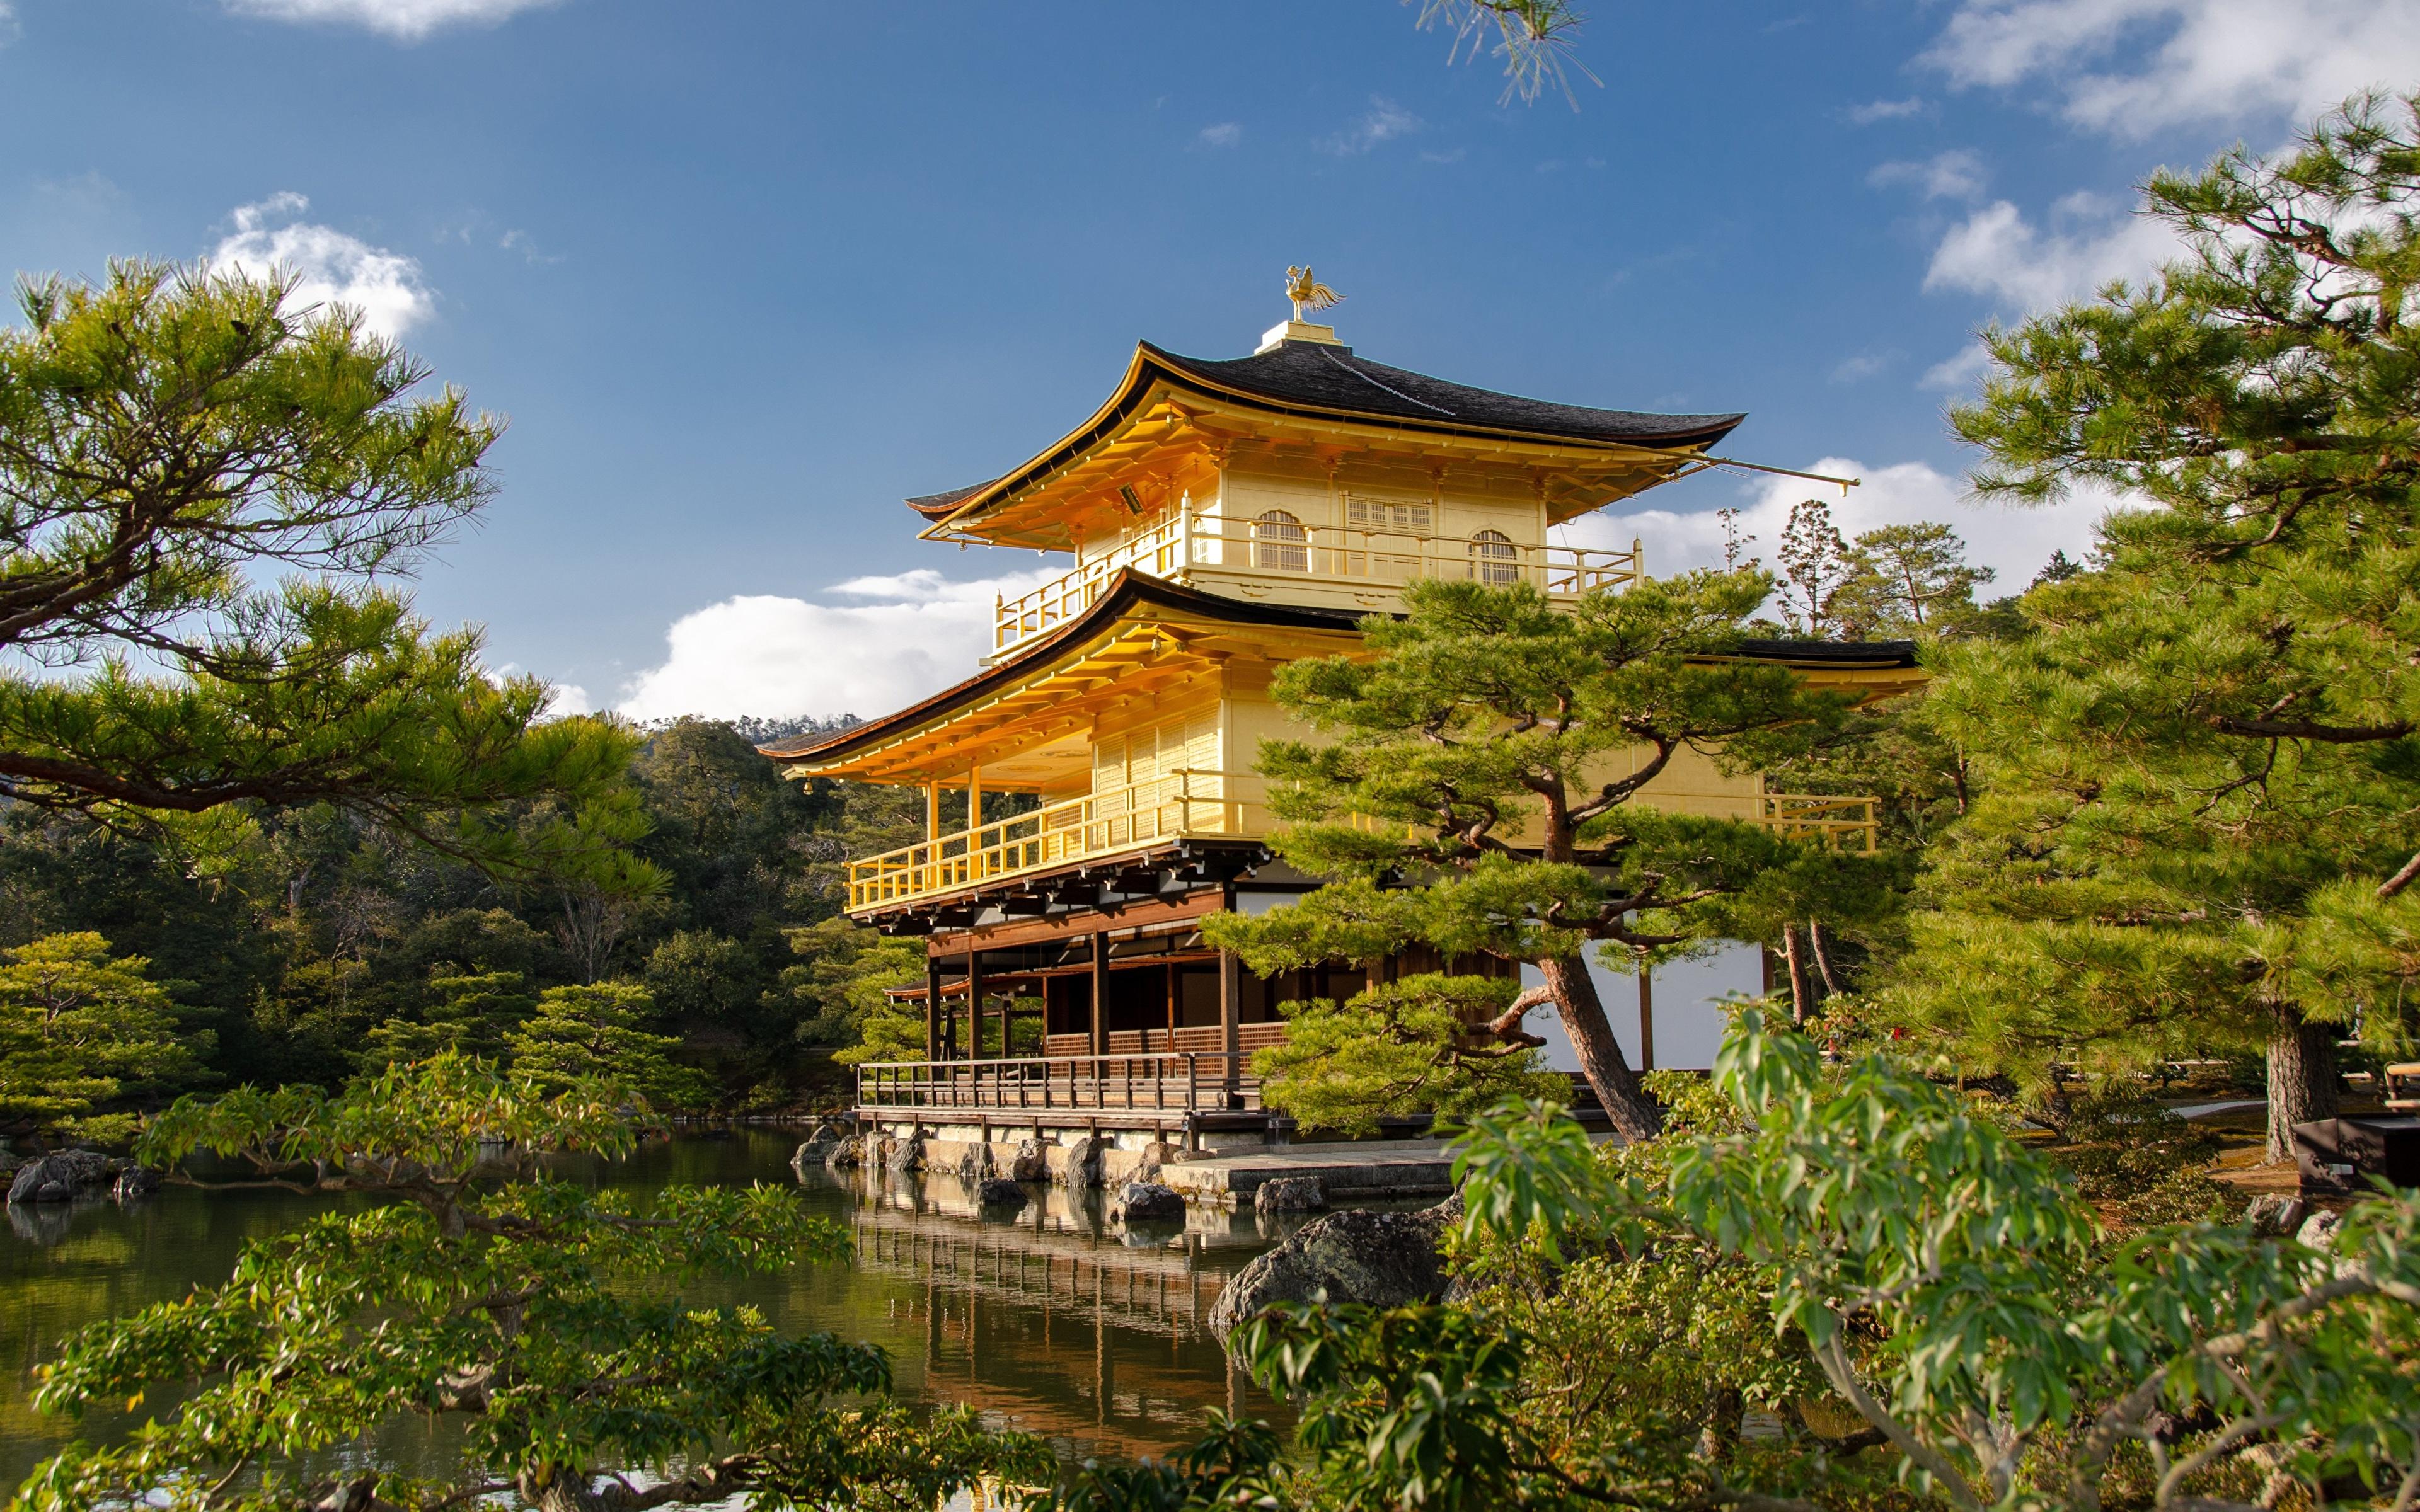 Wallpaper Kyoto Japan Kinkaku-JI Gardens temple Cities 3840x2400 Temples